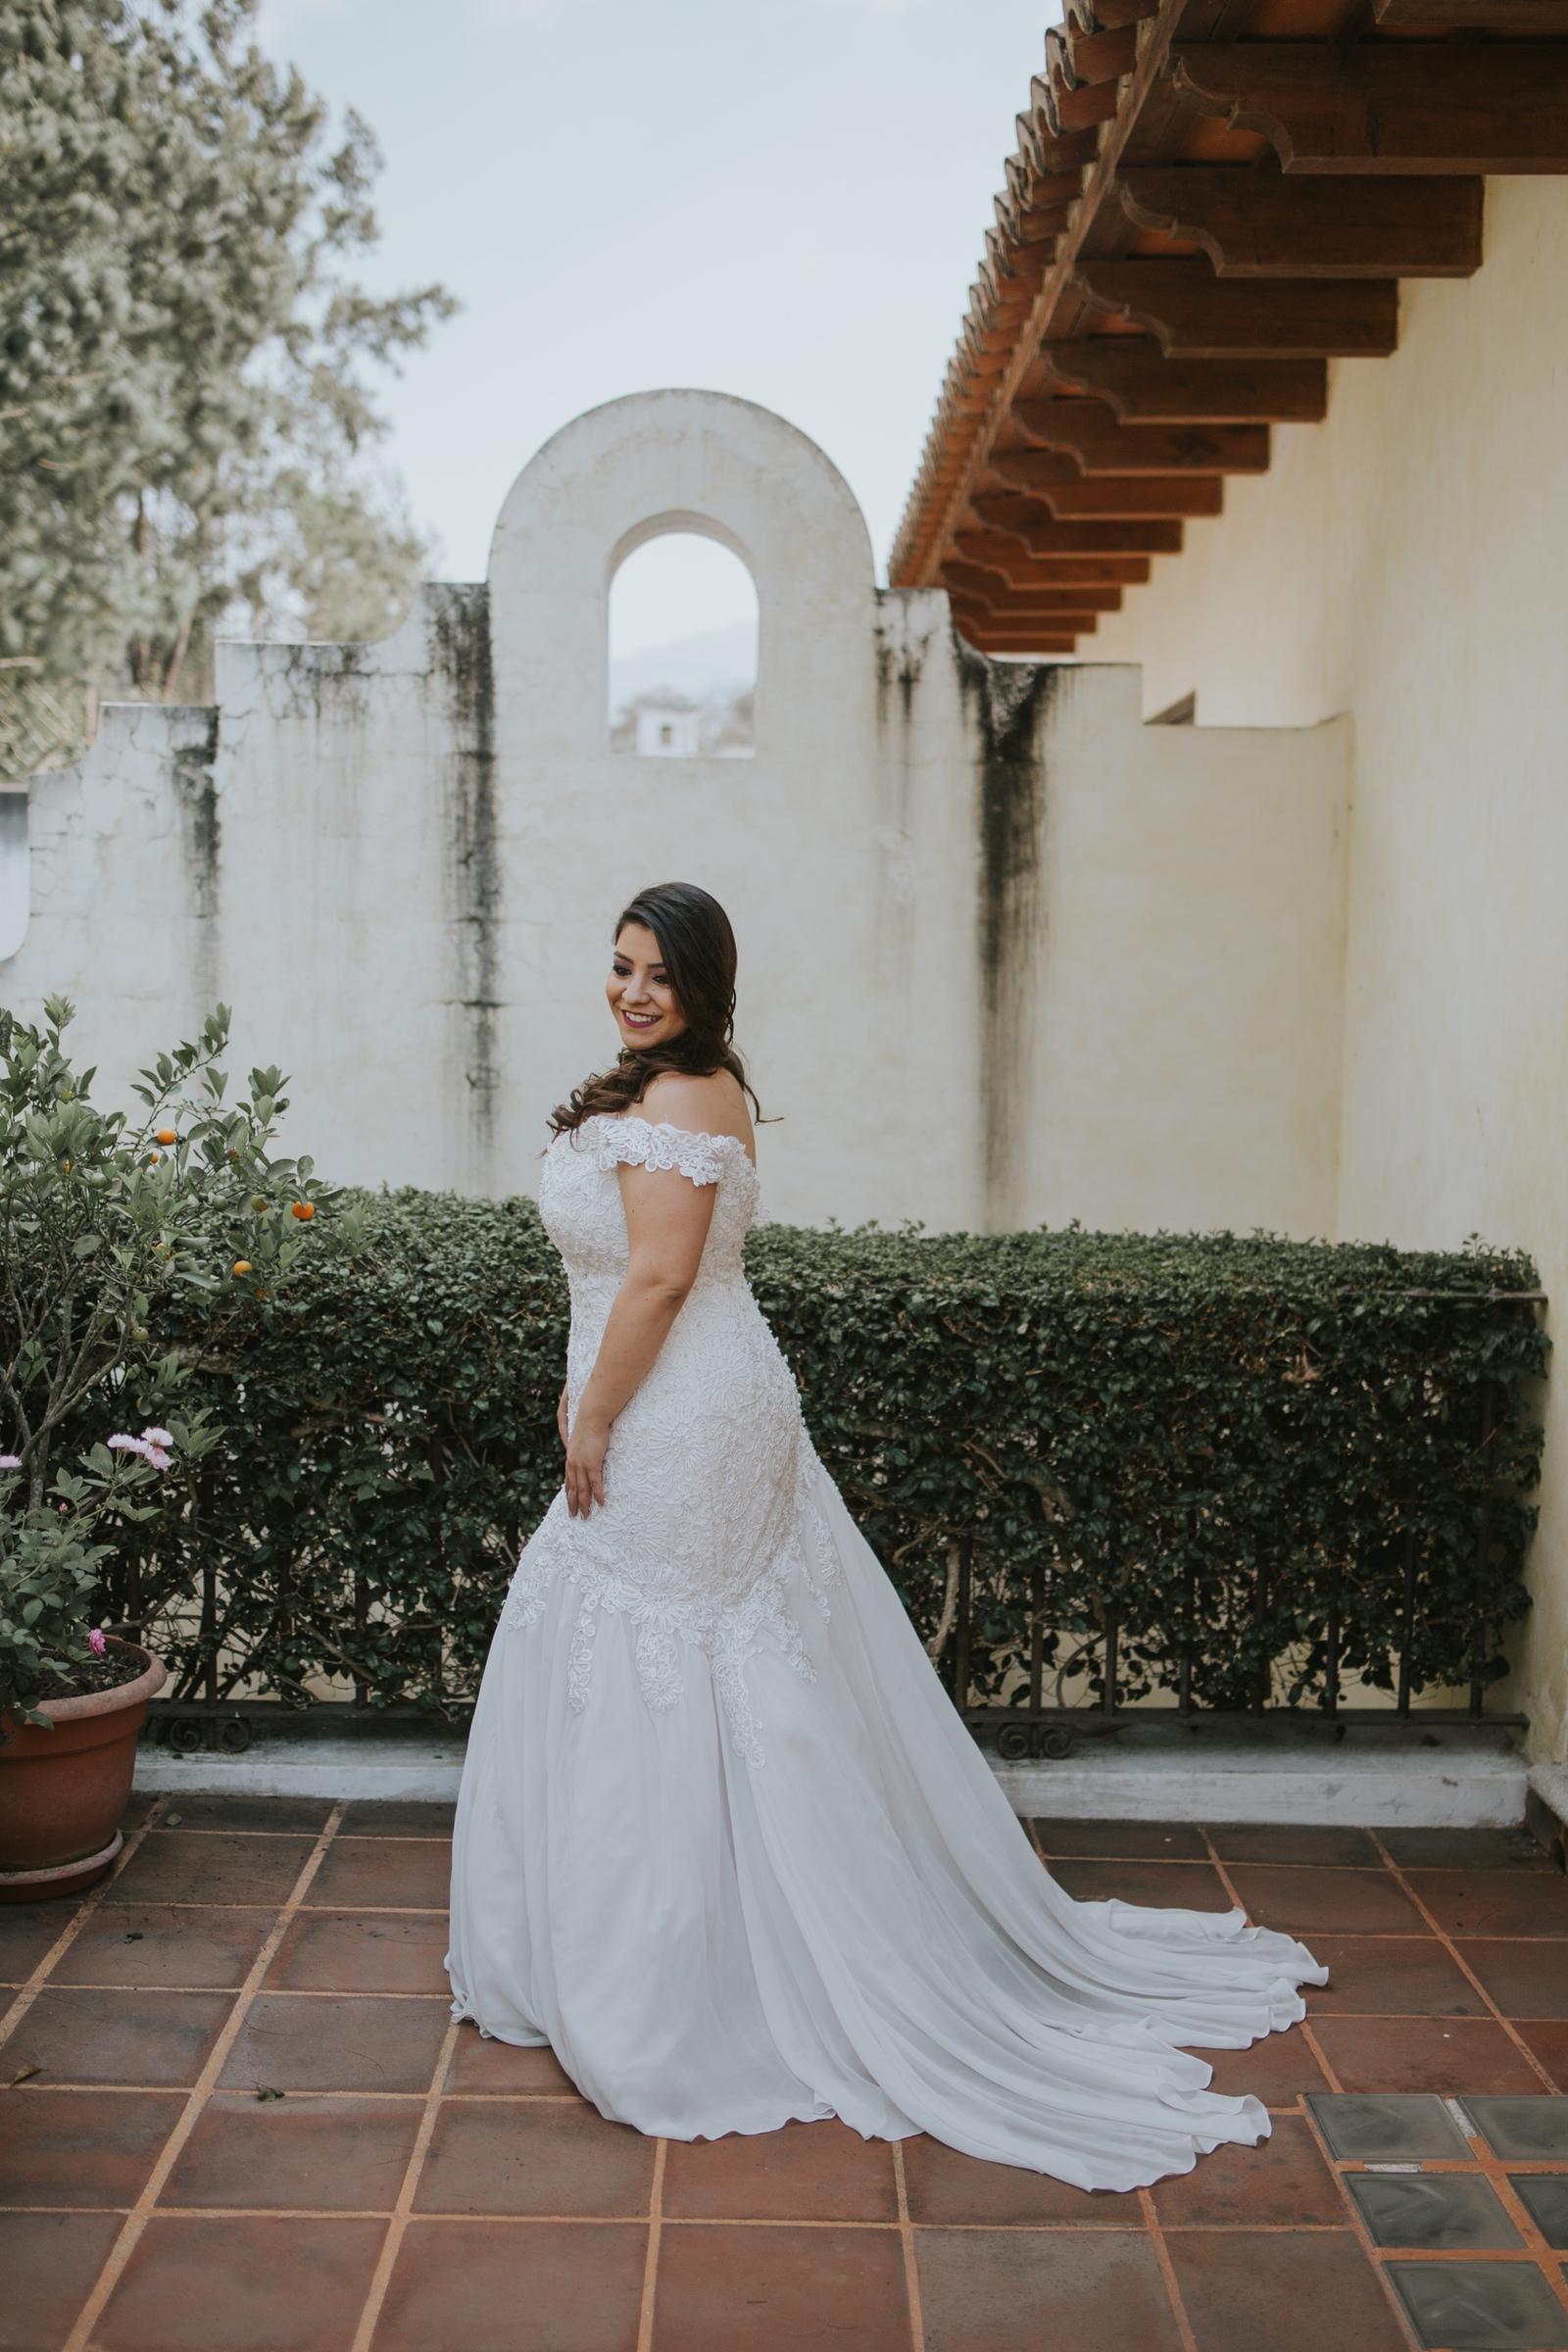 Le Cape Weddings - Creatives in Guatemala - Paulina and JP-8.jpg